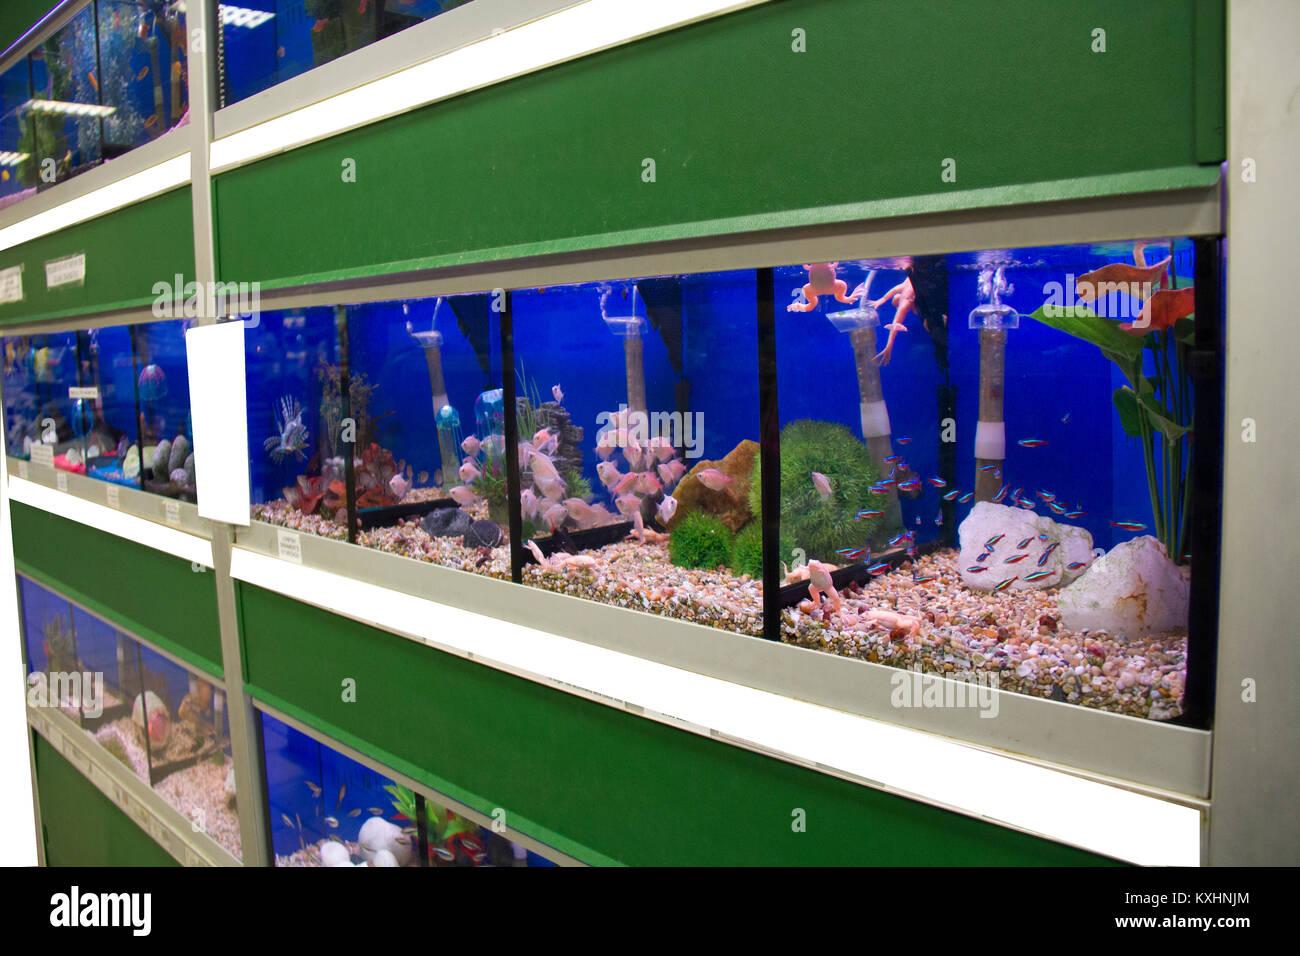 Pet store fish tanks stock photos pet store fish tanks for Pet supermarket fish tanks